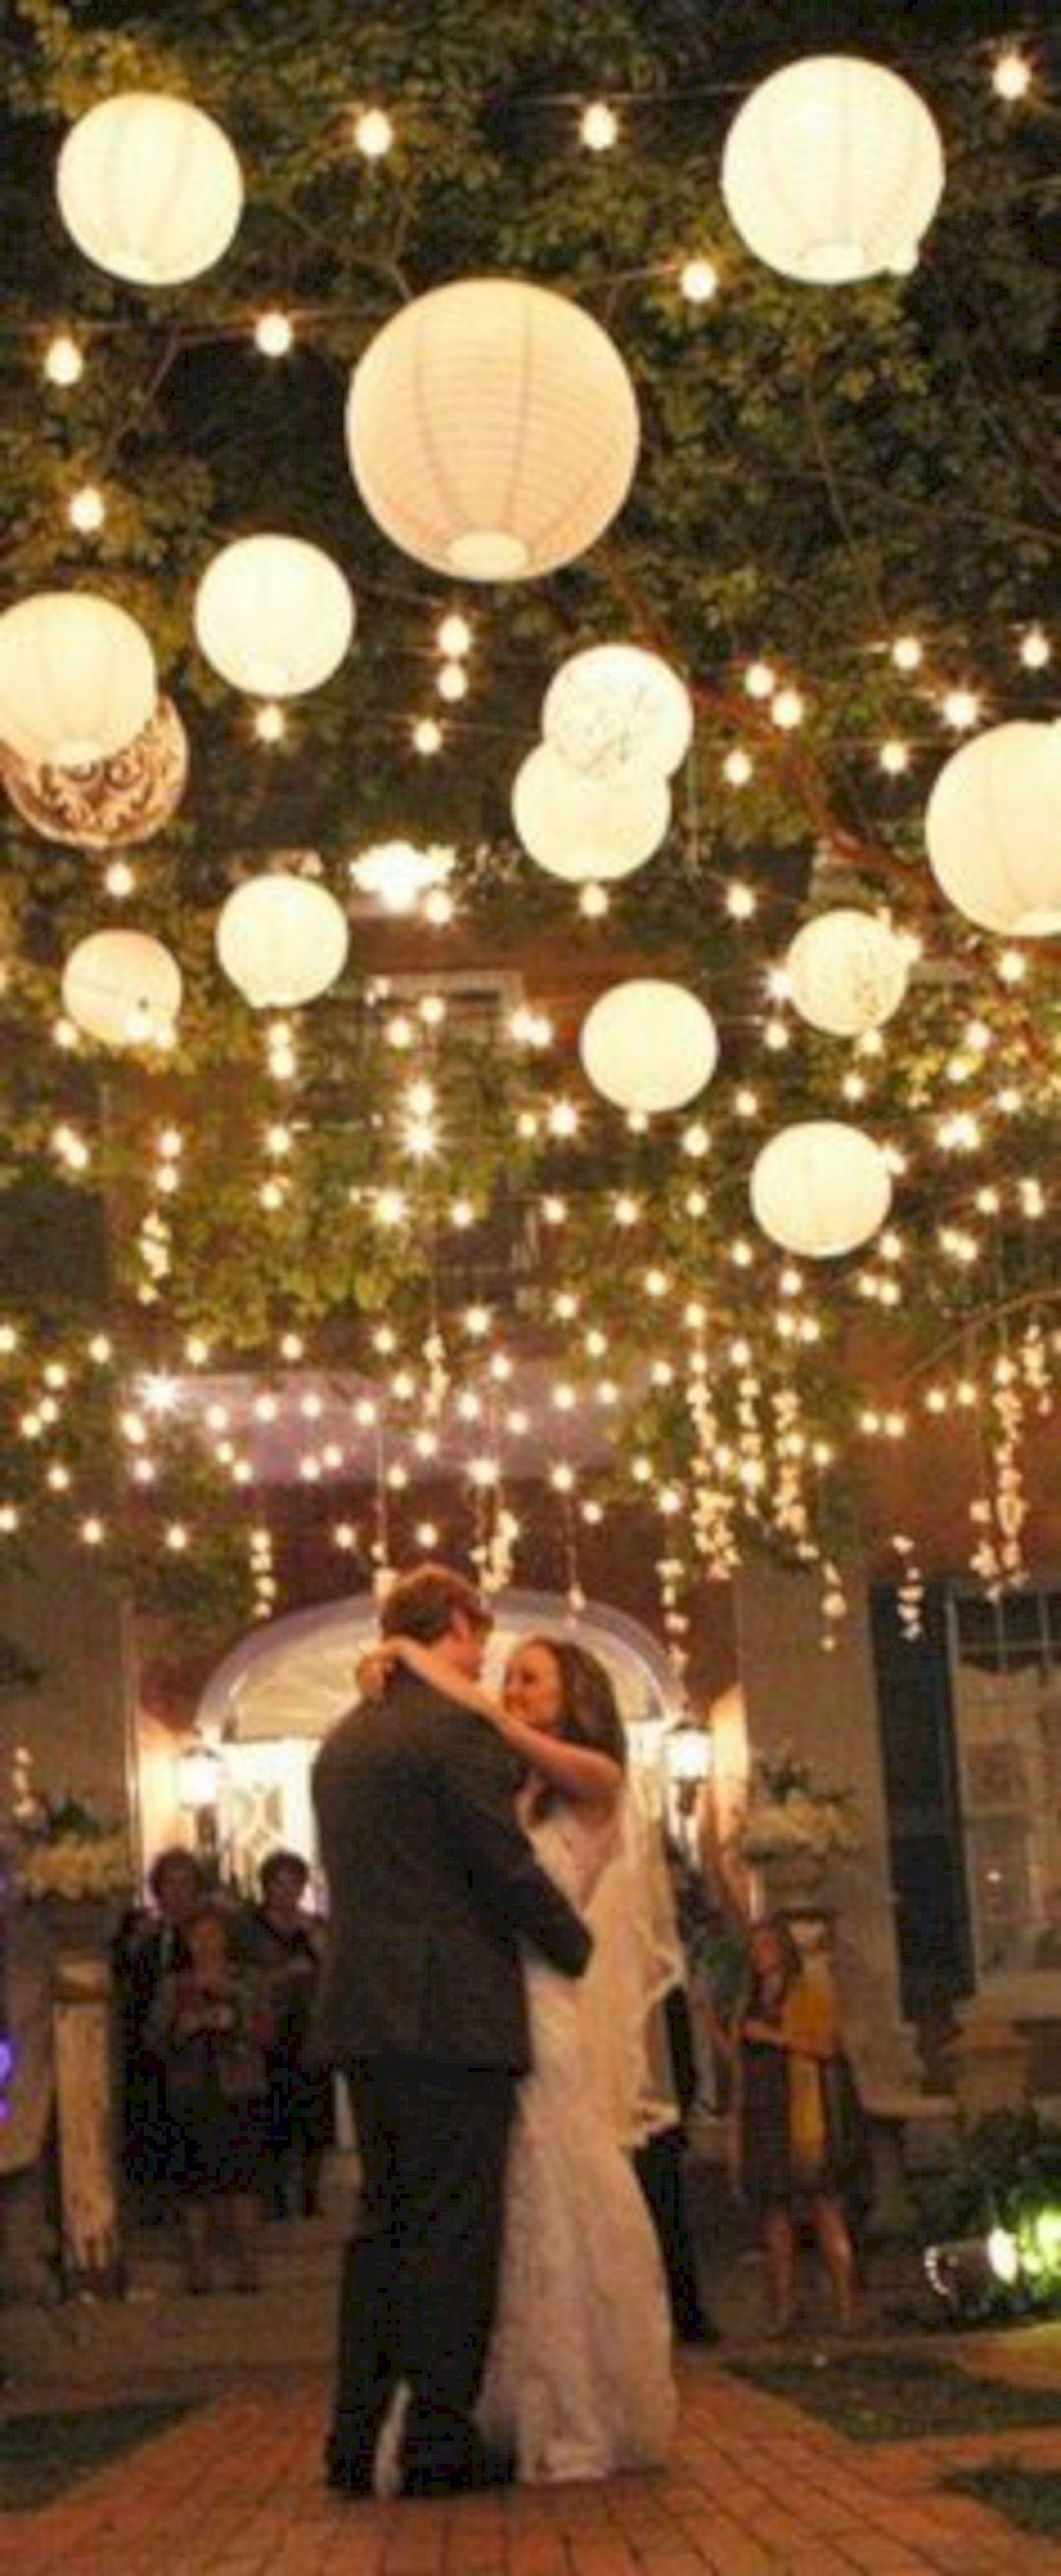 Fairy light wedding decoration ideas  Amazing Wedding Lighting Decoration Ideas  Best Lighting Ideas